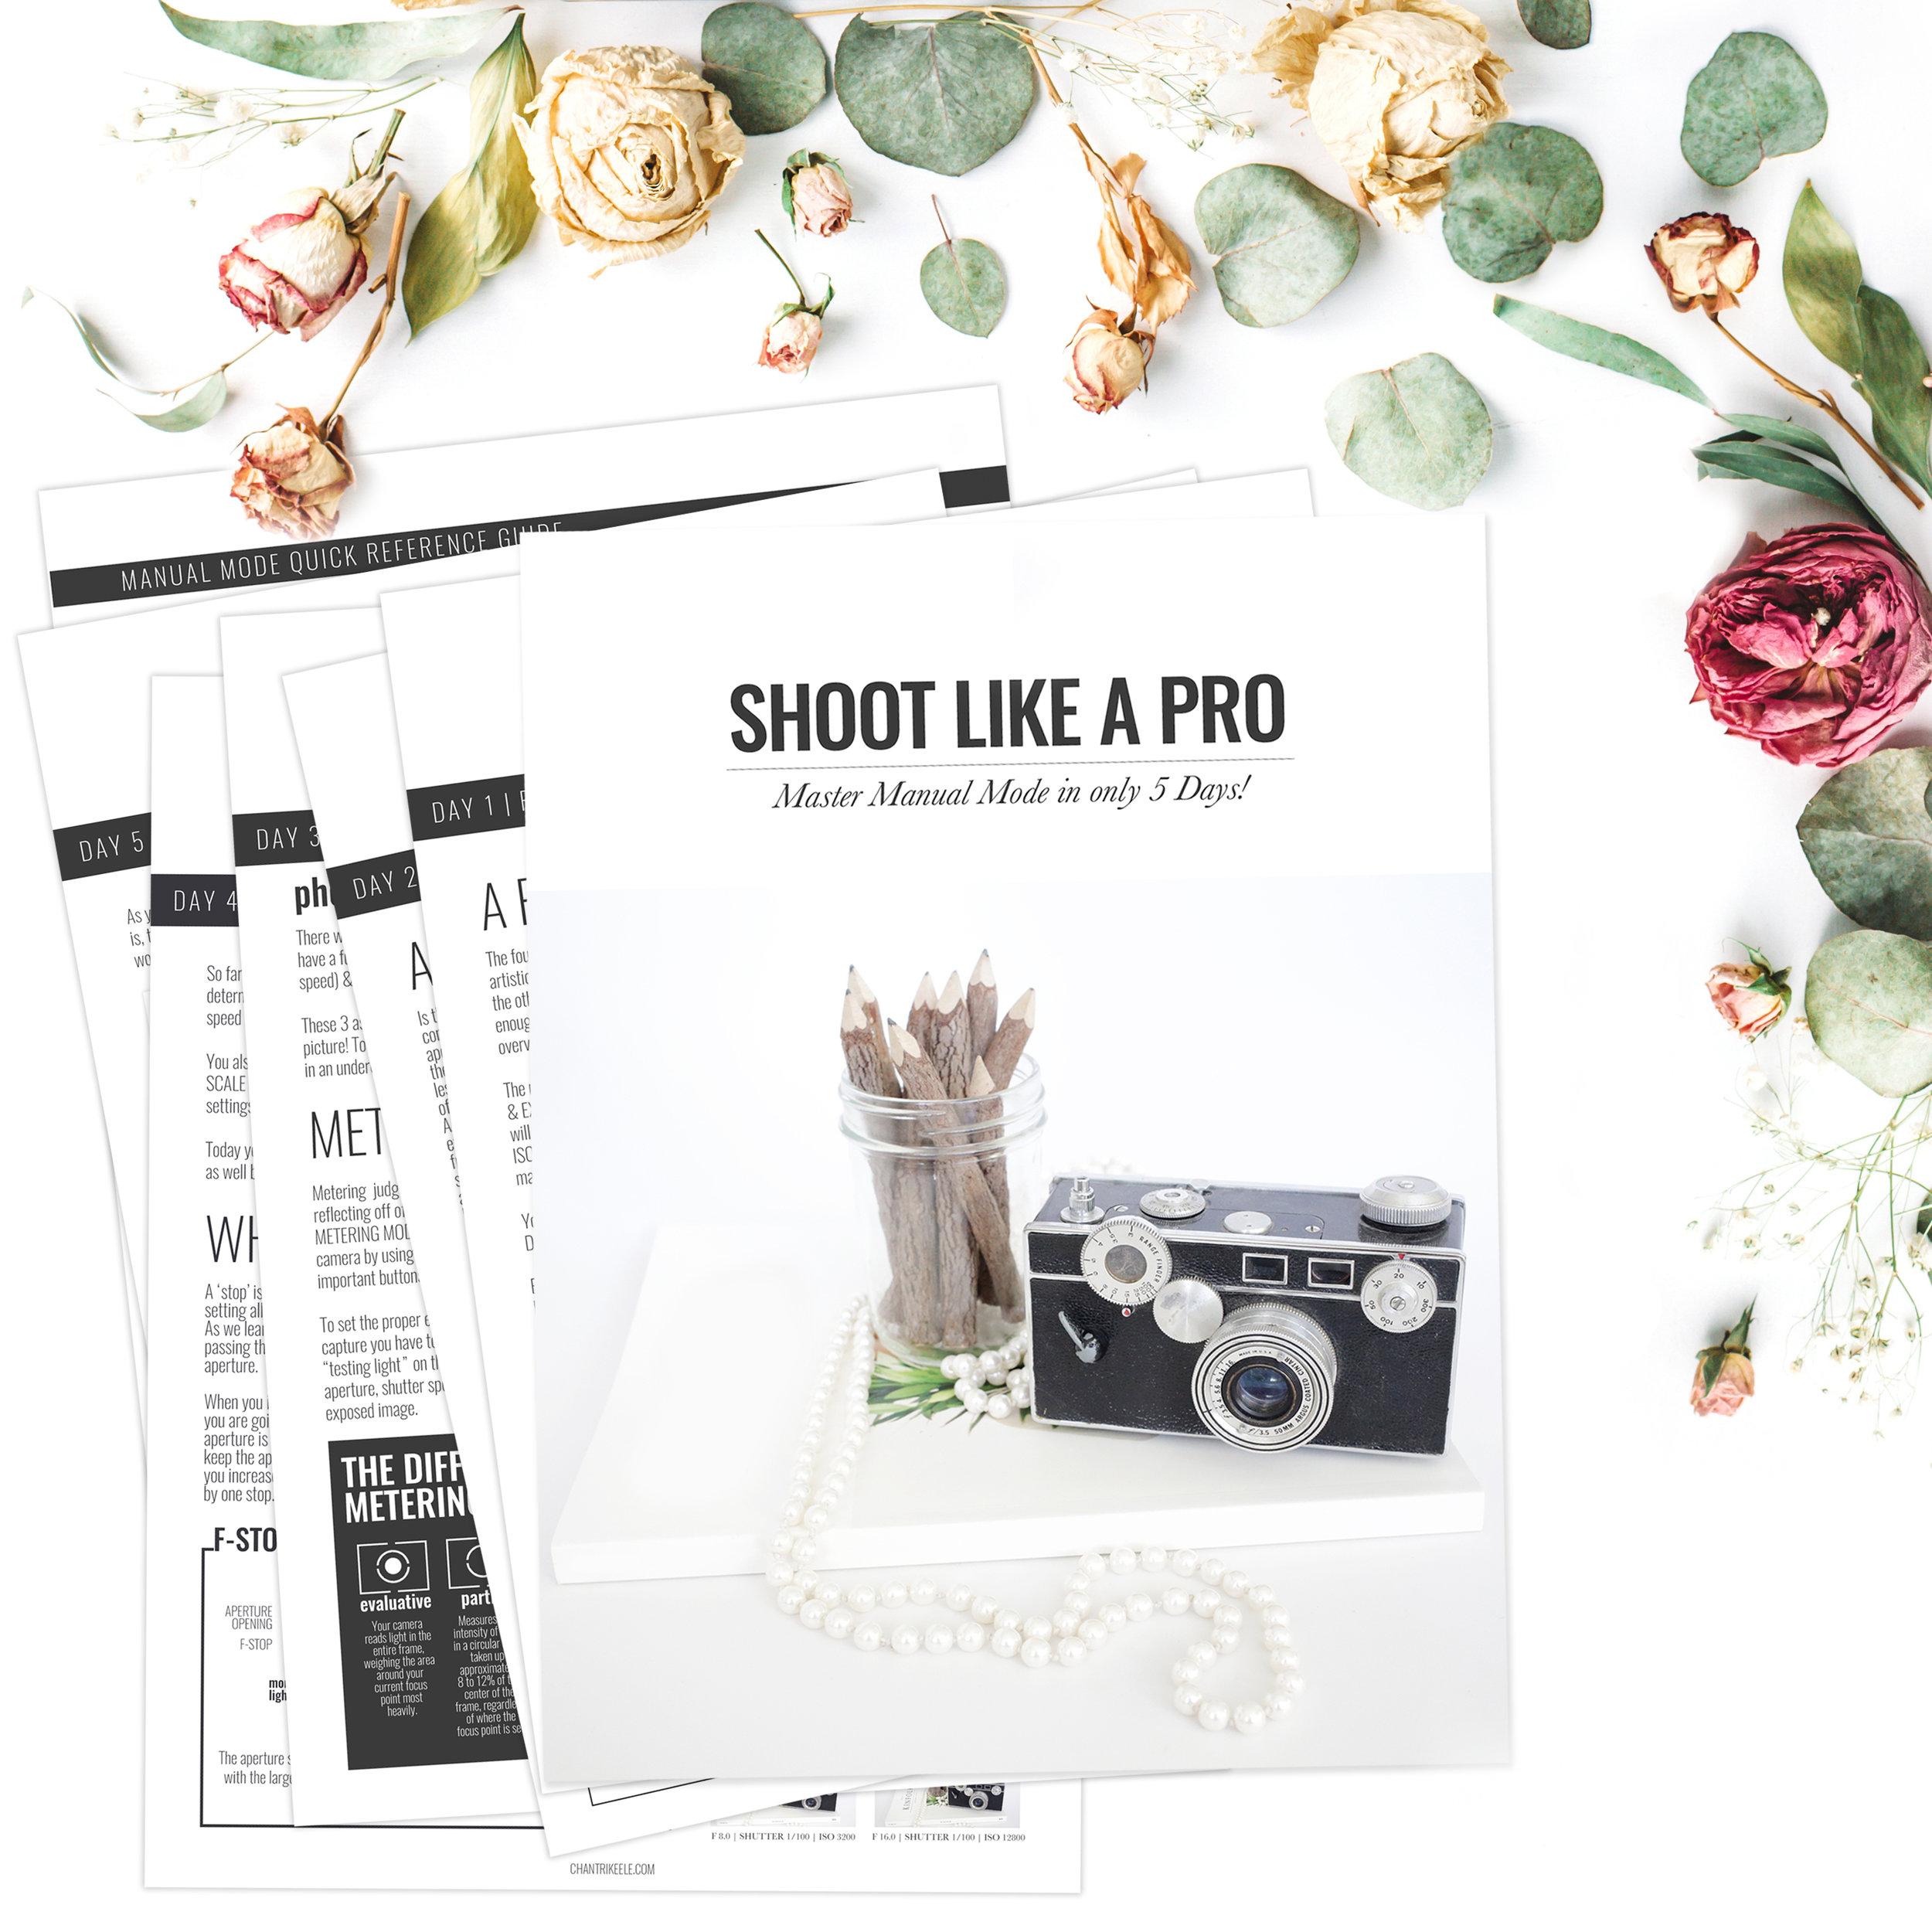 SHOOT LIKE A PRO_IMAGE.jpg